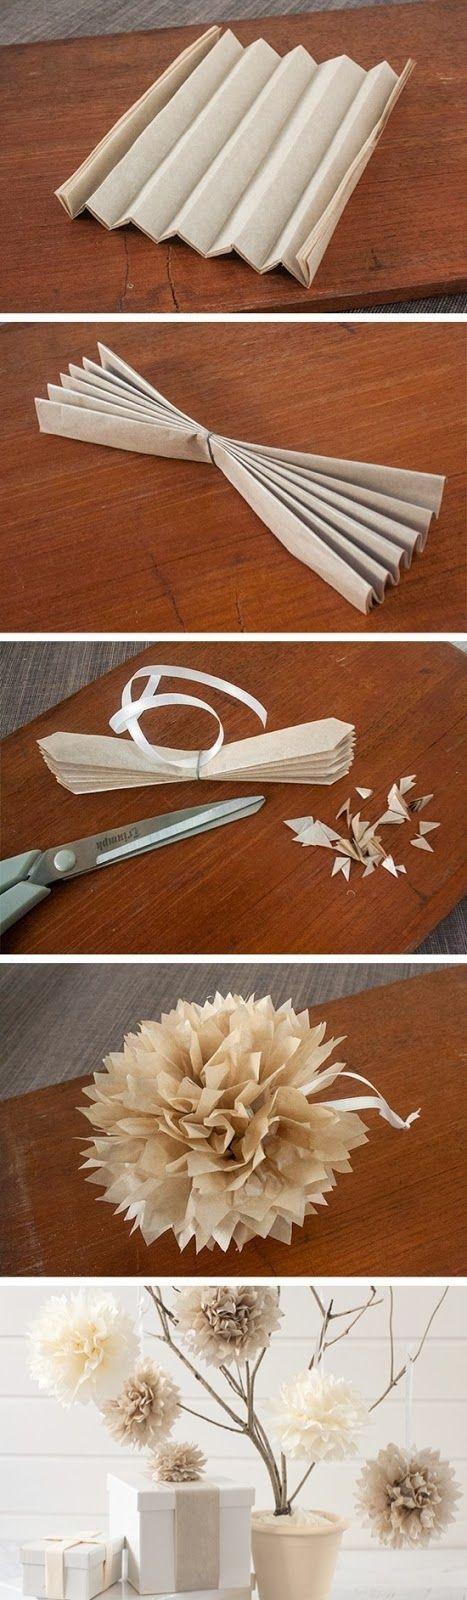 Simple Paper Flowers.      -   #crafts  #diy